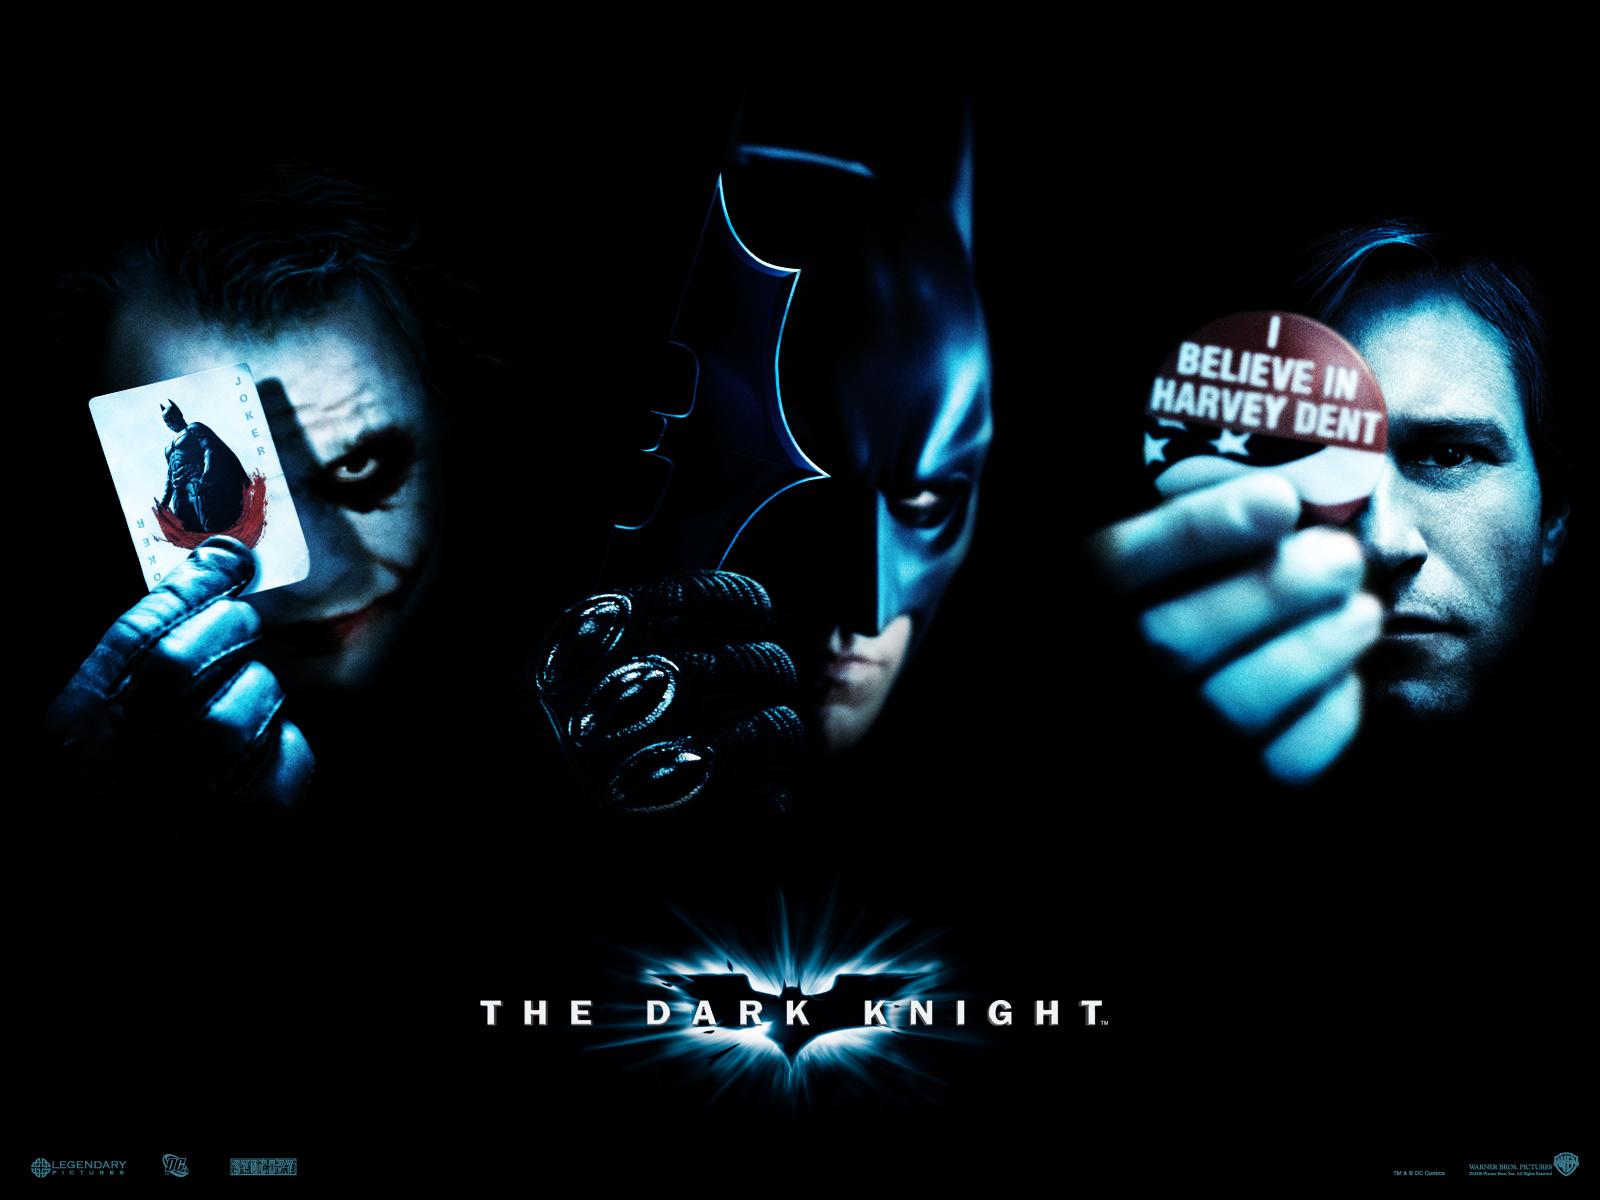 batman movie HD wallpaper downloadbatman movie wallpaper download 1600x1200